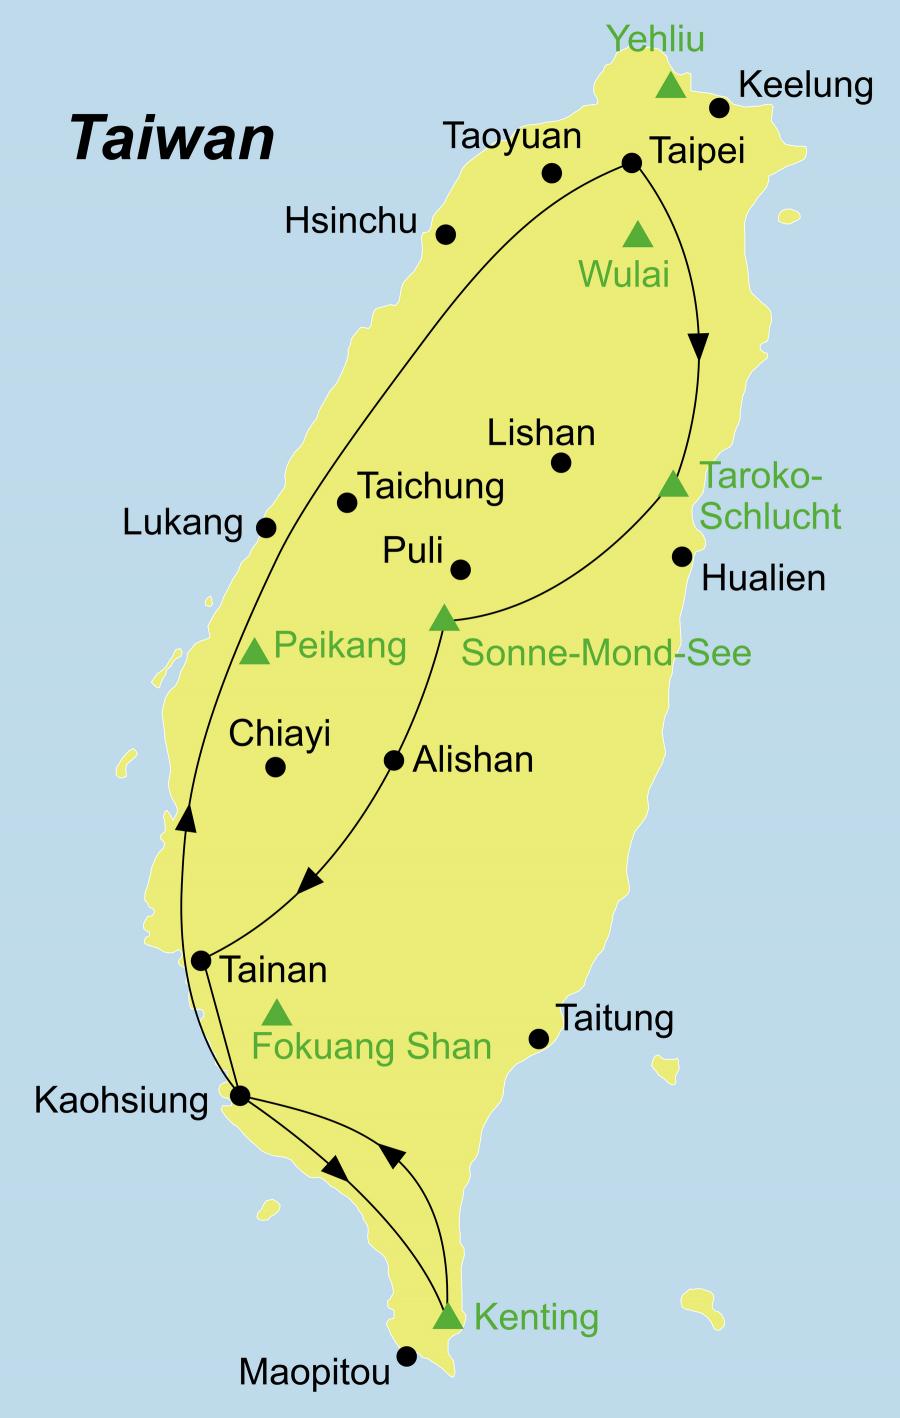 Die Taiwan individuell Rundreise führt von Taipeh (Taipei) über Taroko, Sonne-Mond-See, Alishan, Tainan, Kaohsiung, Kenting Nationalpark zurück nach Taipei (Taipeh).